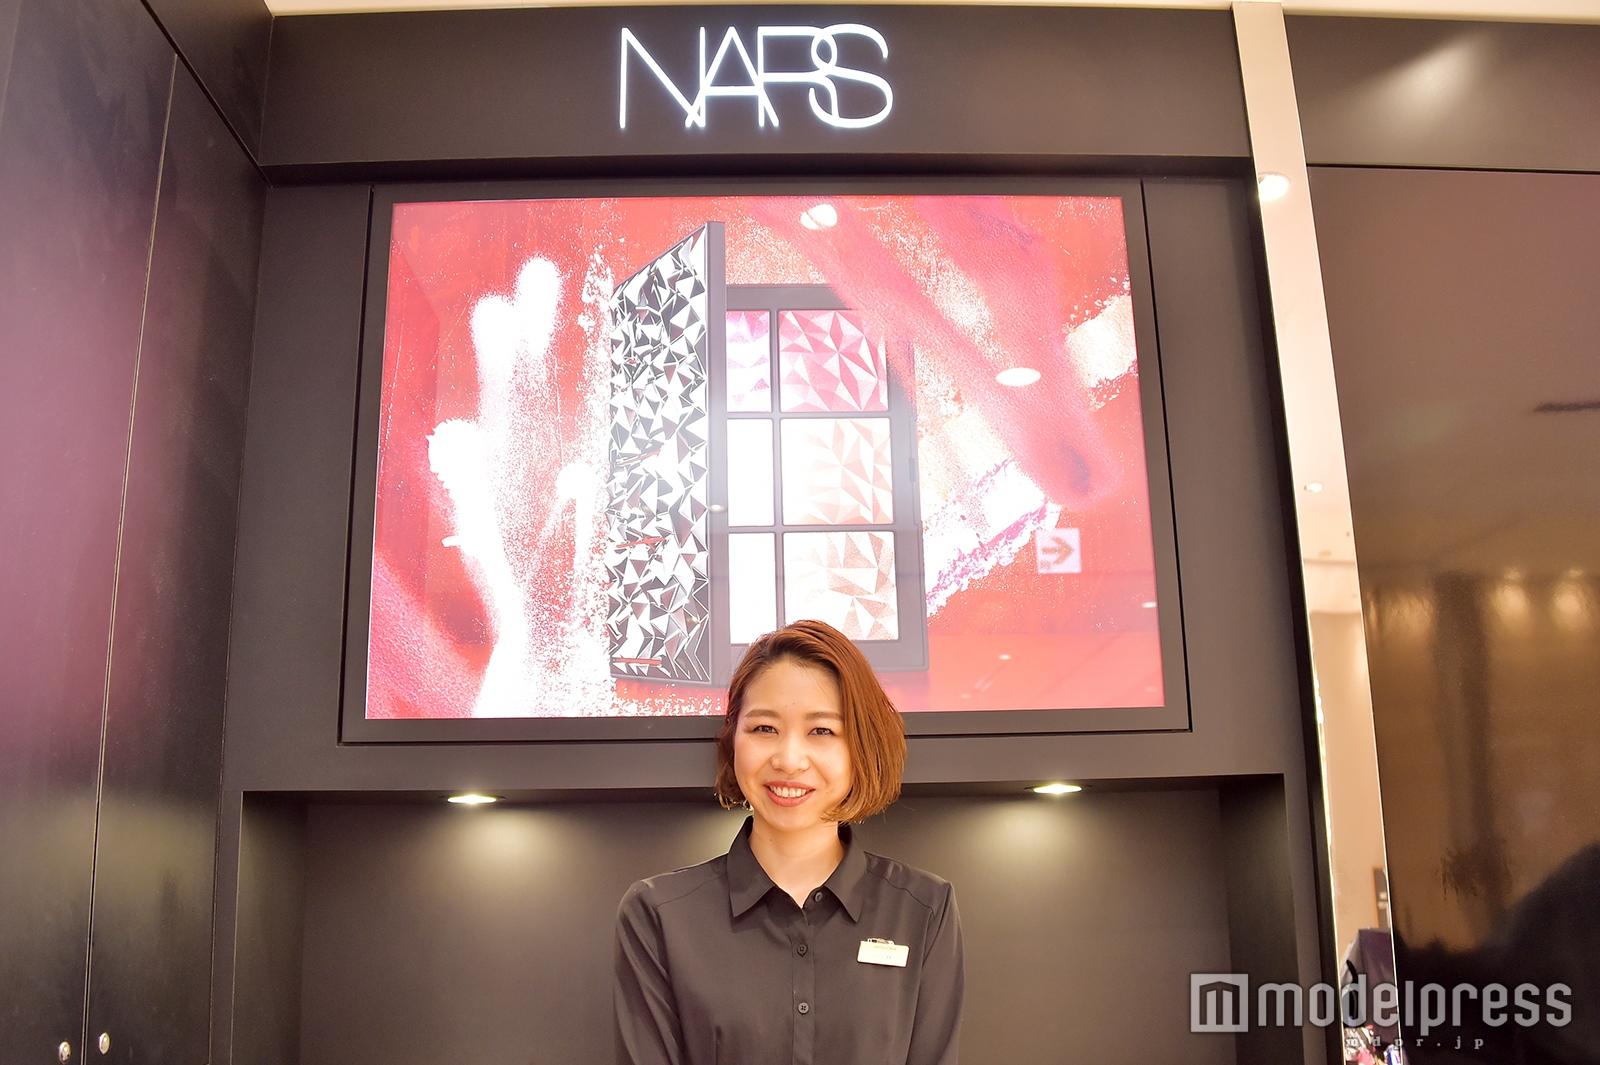 「NARS」ショップチーフの小林彩香さん(C)モデルプレス